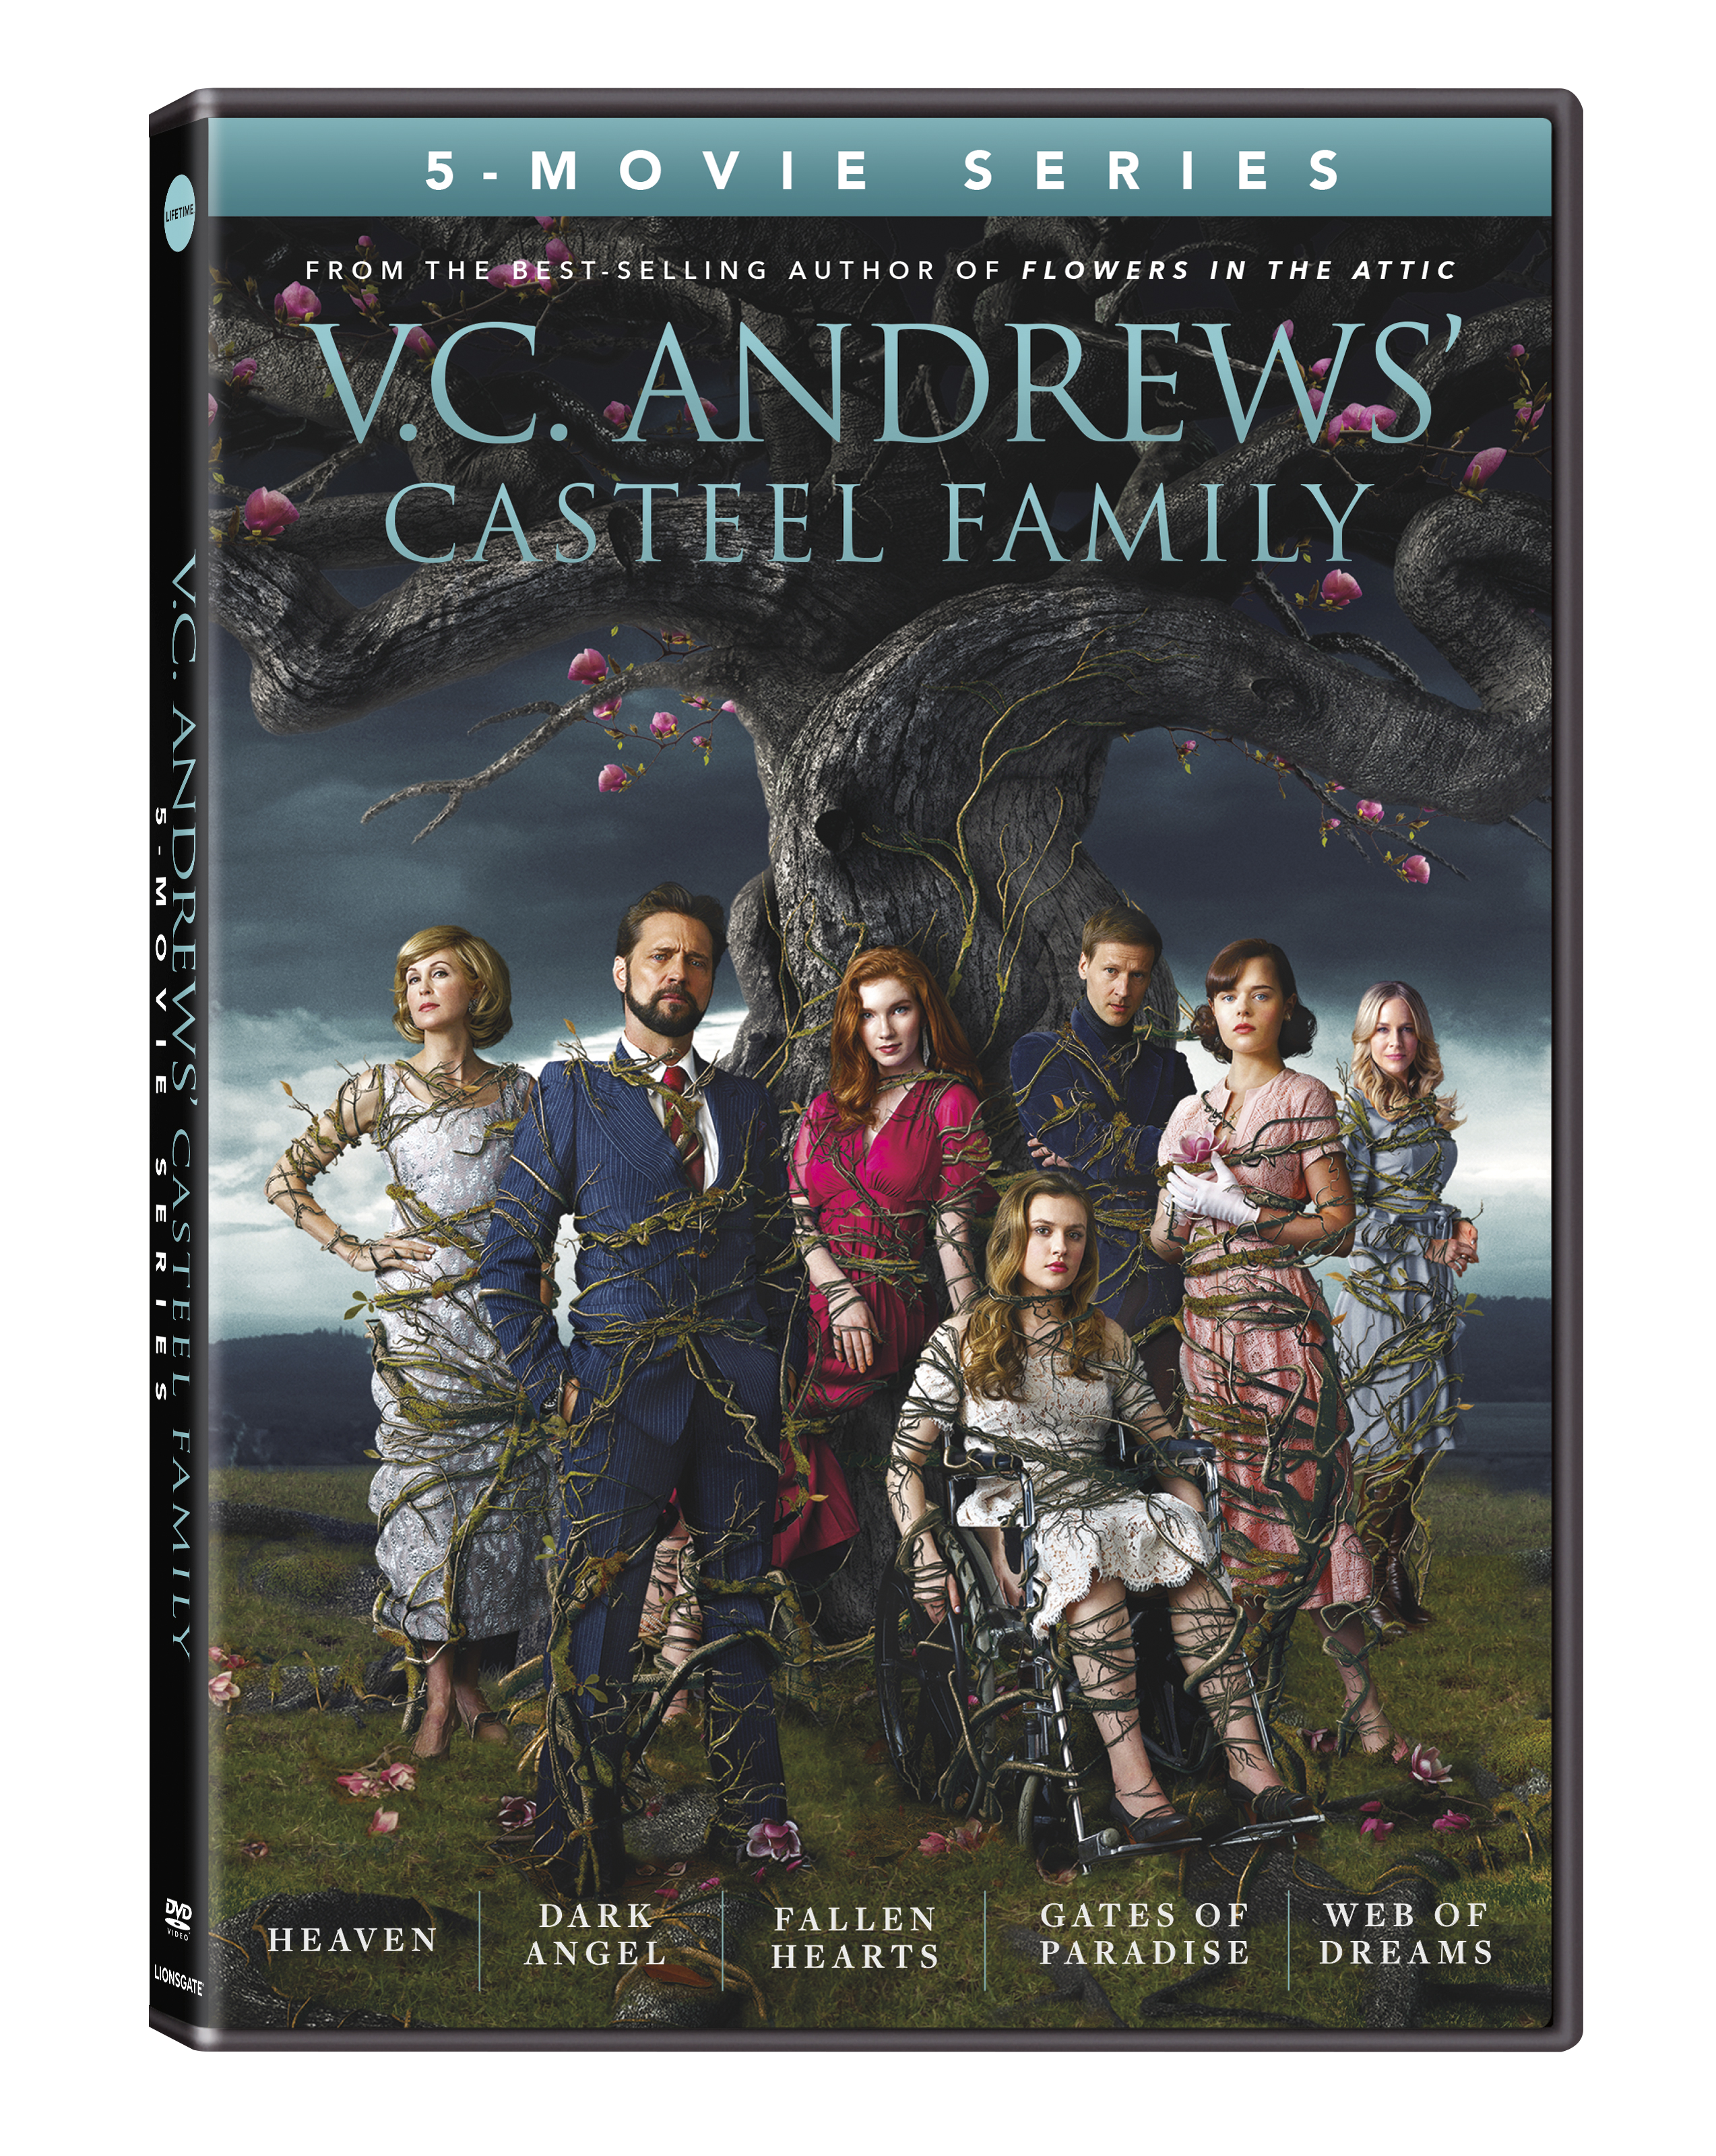 Dvd Date For V C Andrews S Casteel Family 5 Movie Series In 2020 Flowers In The Attic Dating Dark Heart